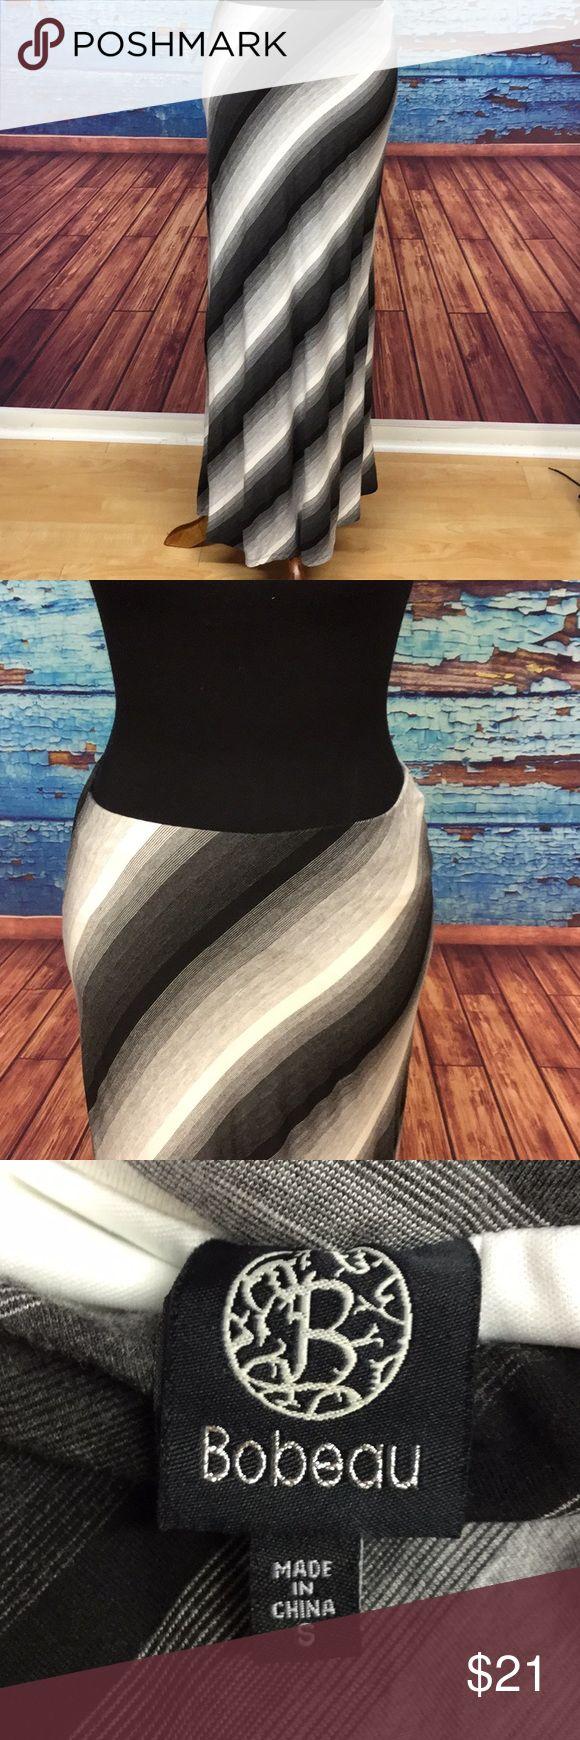 Bobeau maxi skirt small black gray white Diagonal striped maxi skirt No visible flaws Upper part of this skirt is lined 25 waist 38 long bobeau Skirts Maxi